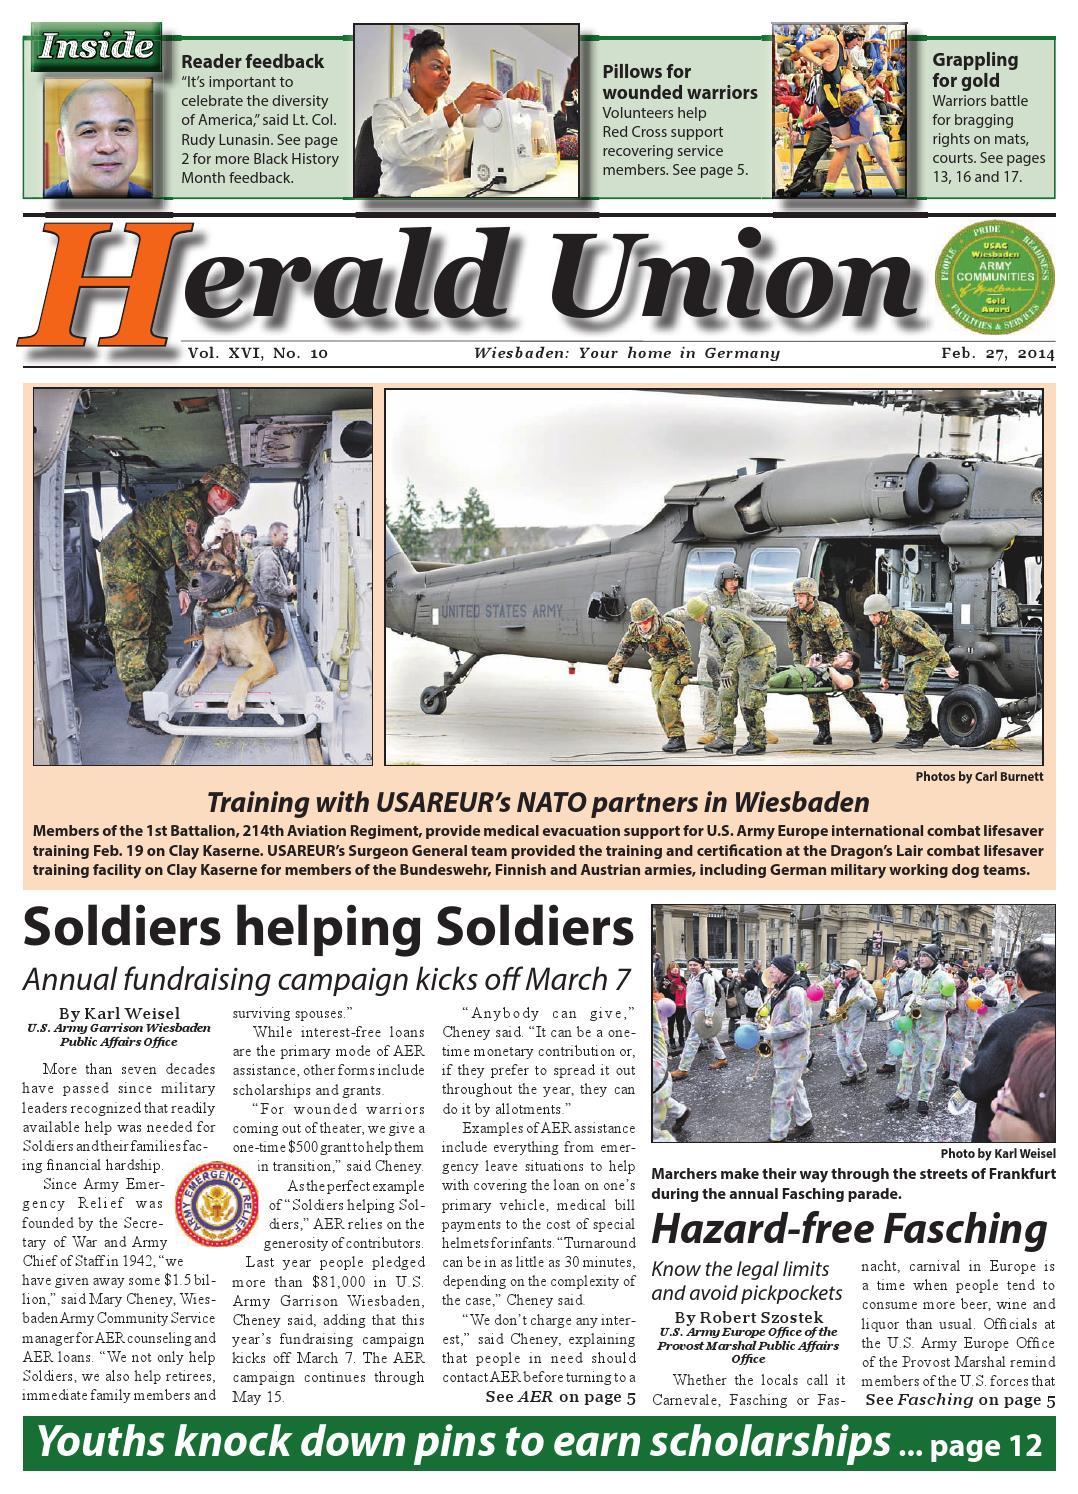 6b9ab185b Herald Union, Feb. 27, 2014 by AdvantiPro GmbH - issuu